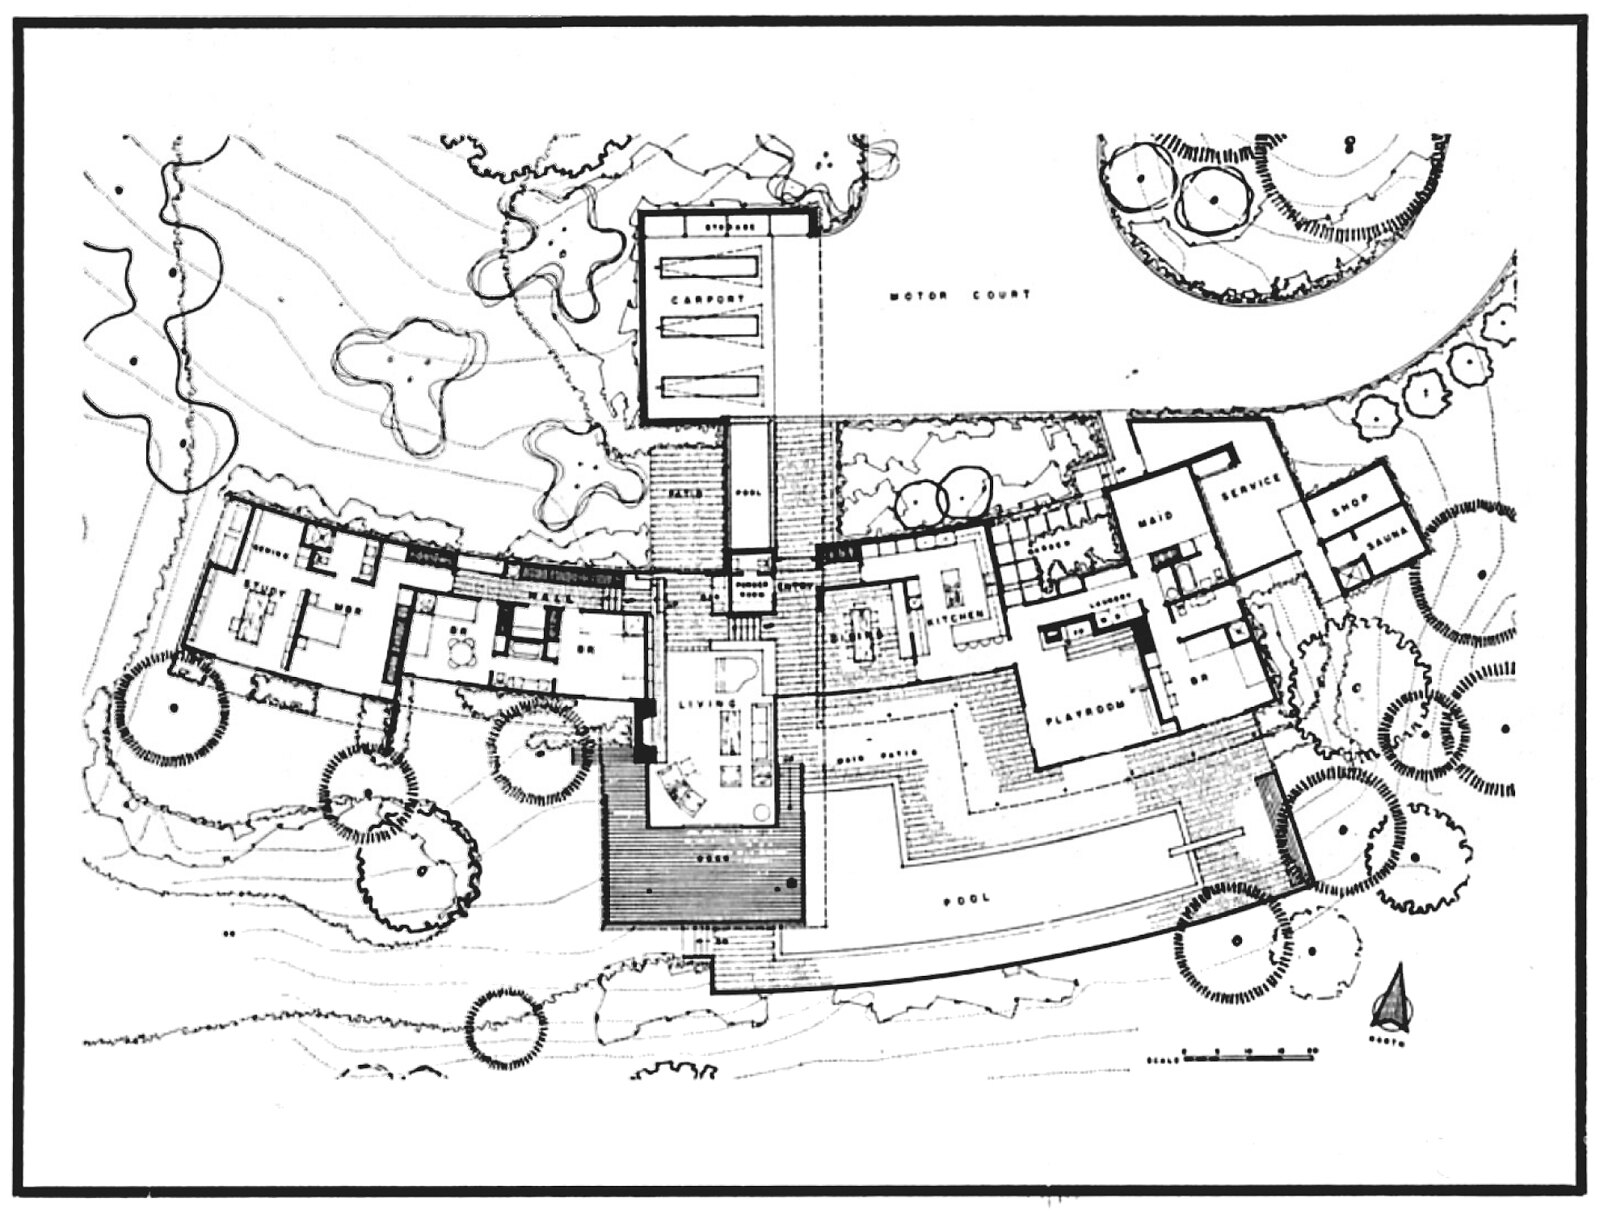 George Vernon Russell - Mallikin Residence - Southern California (1960) Floorplan